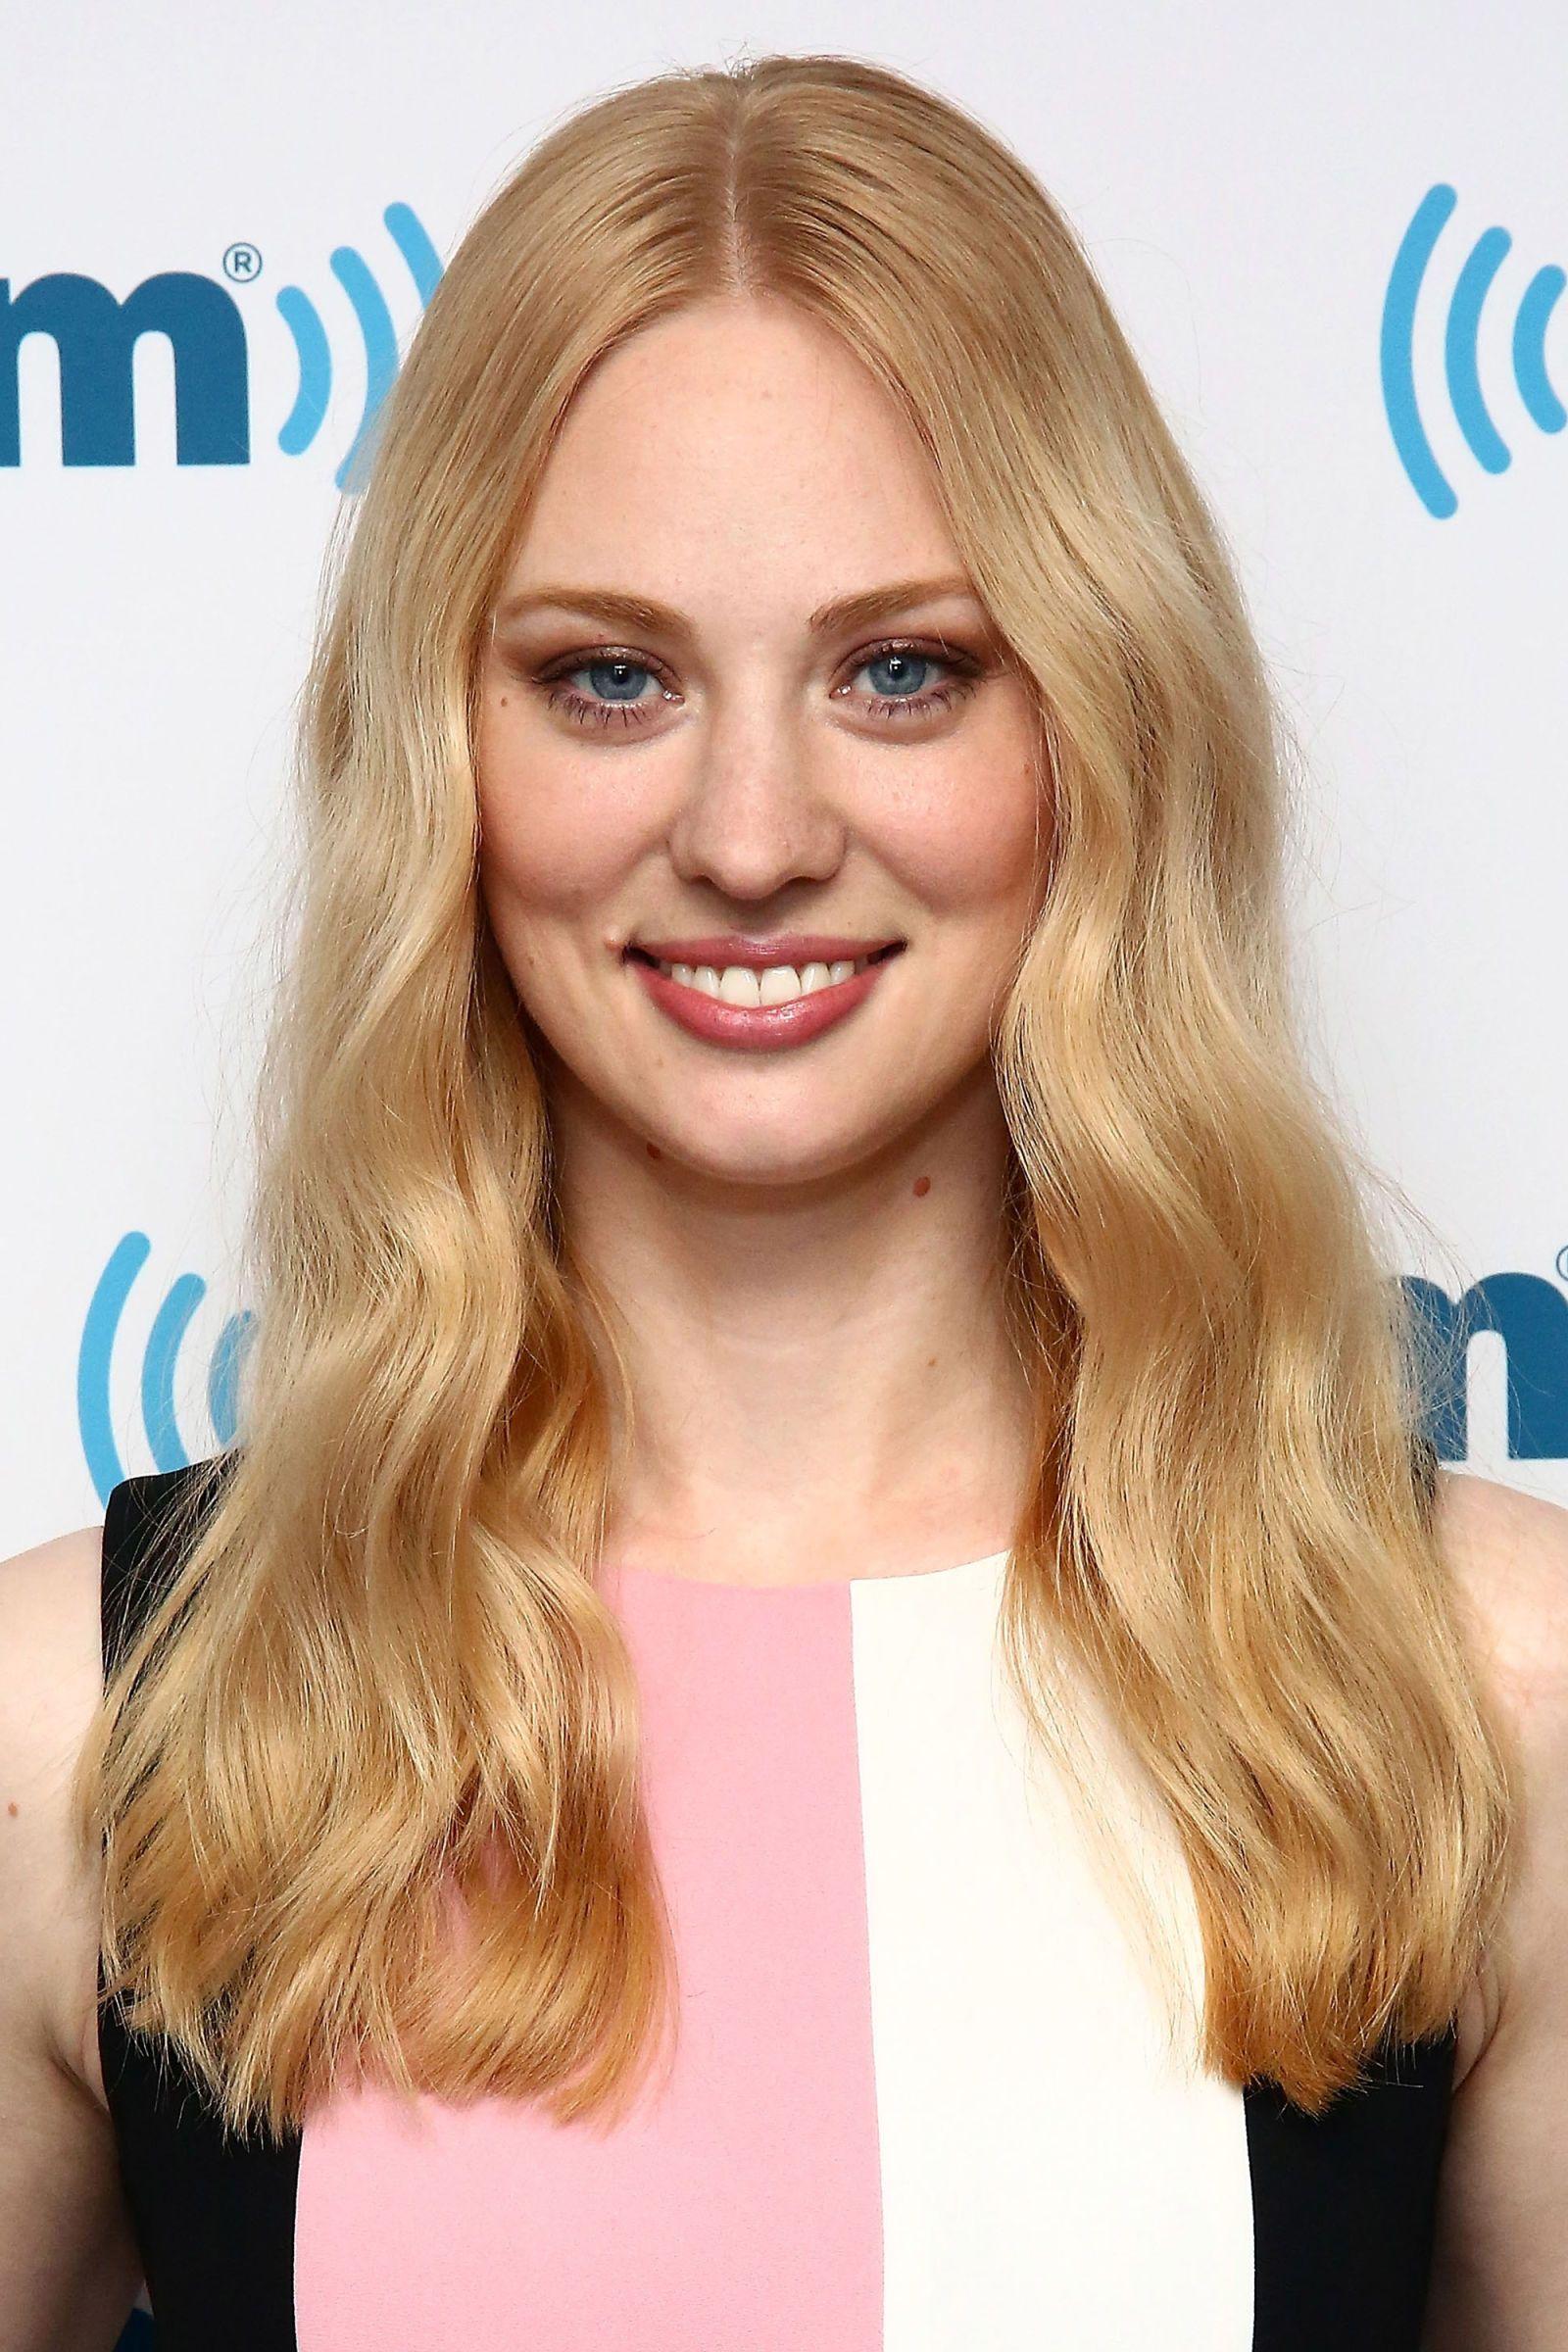 16 New Ways To Wear Strawberry Blonde Hair Hairs Pinterest